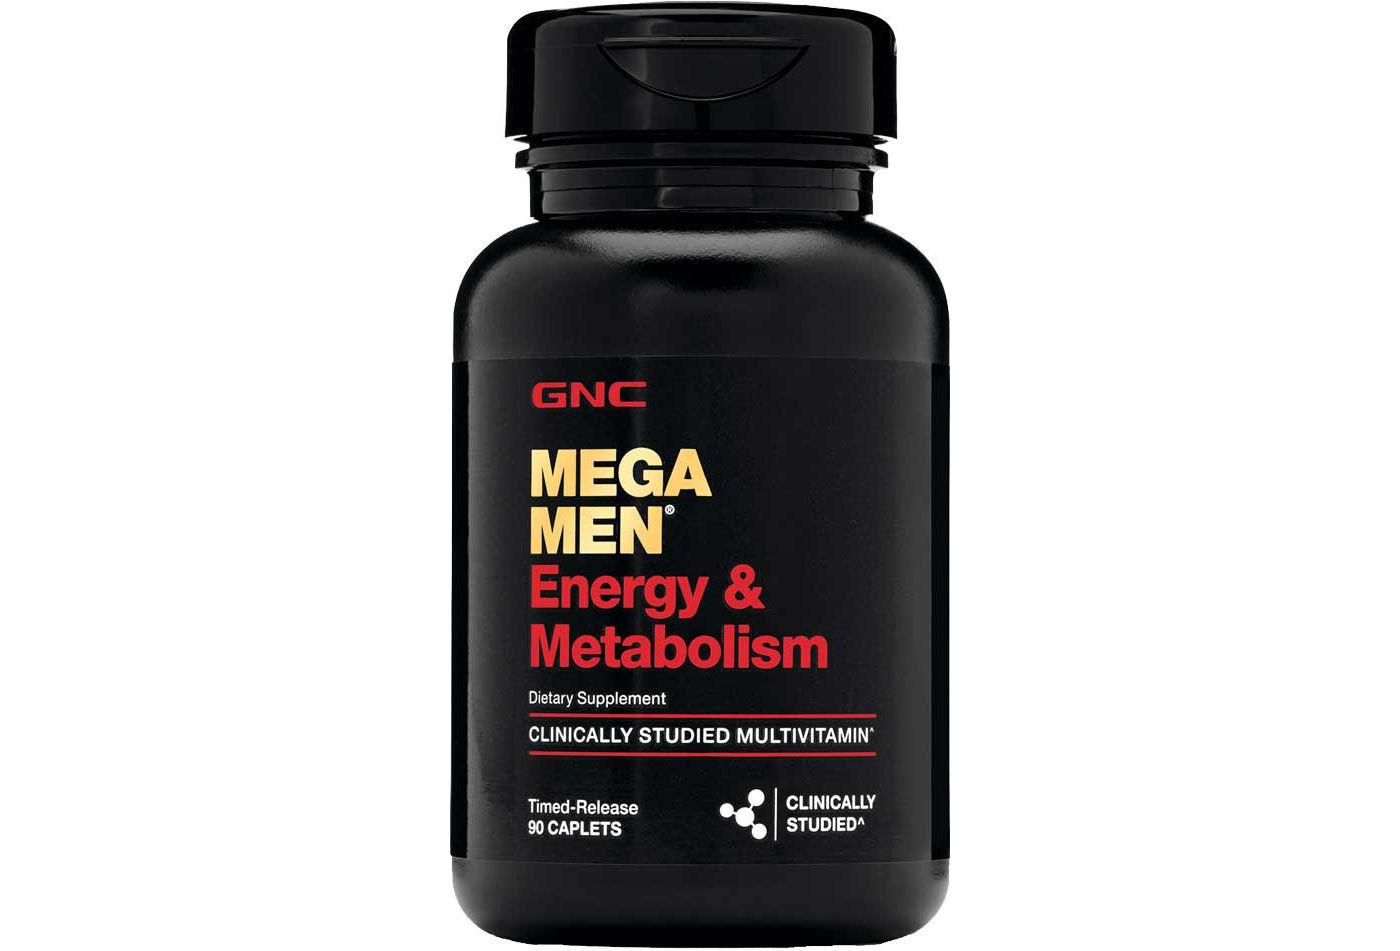 GNC Mega Men® Energy & Metabolism 90 Caplets